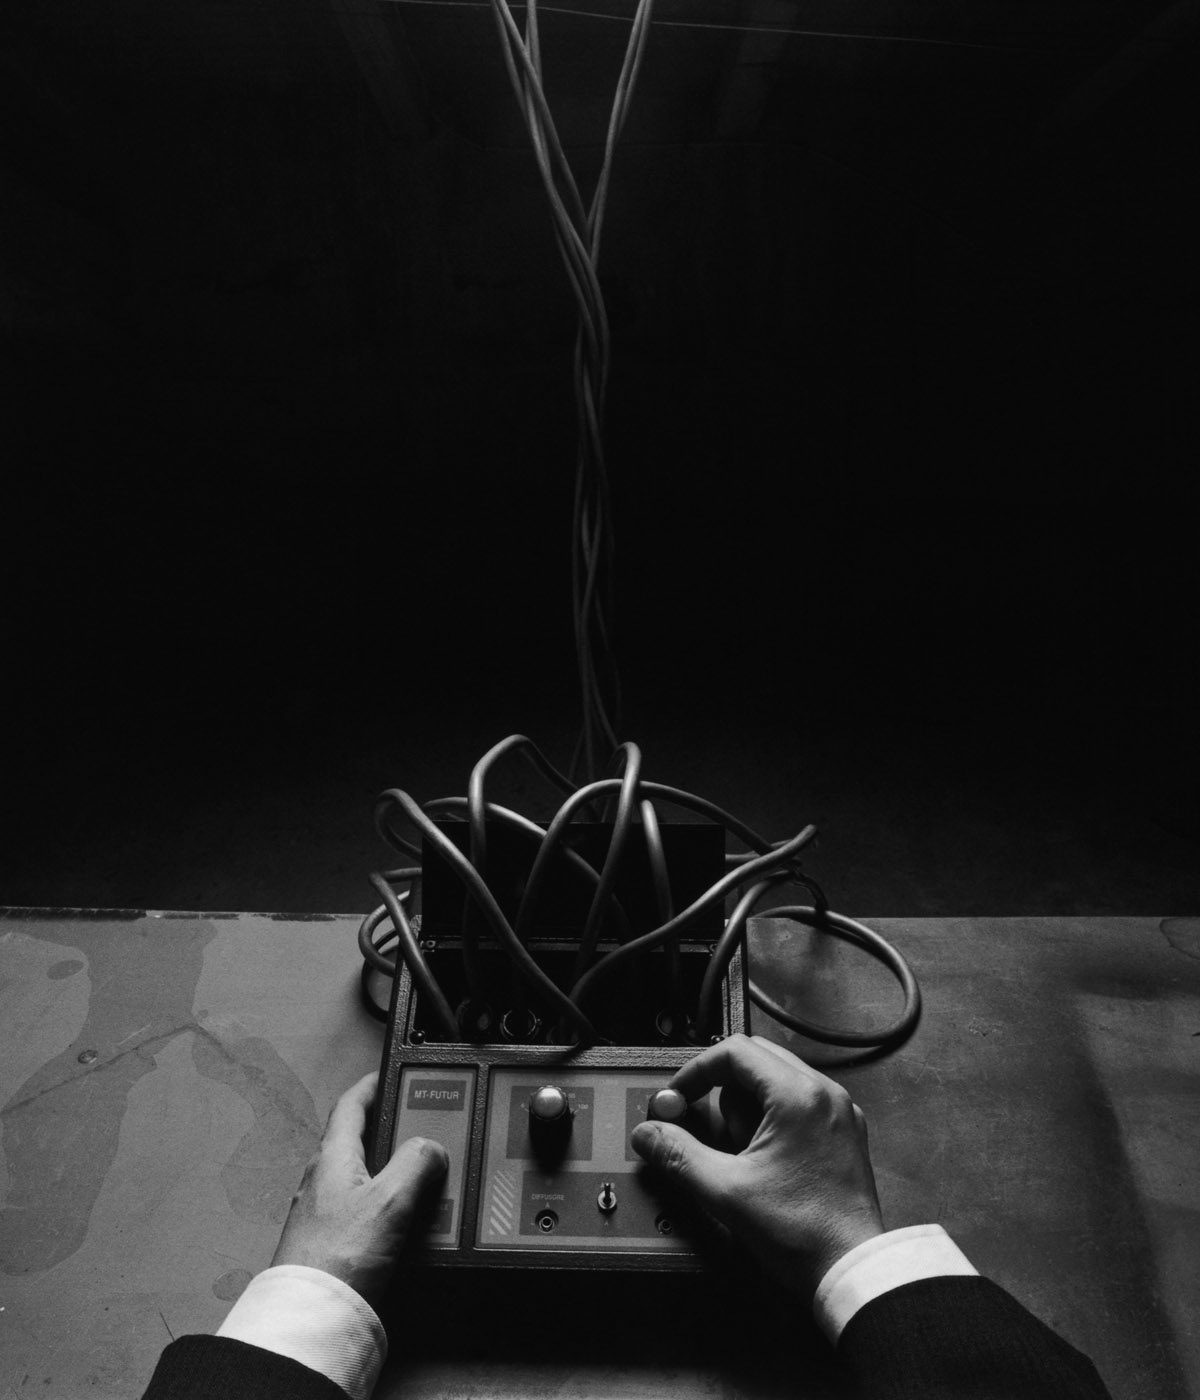 Francesco Nonino, Come se la vergogna, 2010, foto b-n